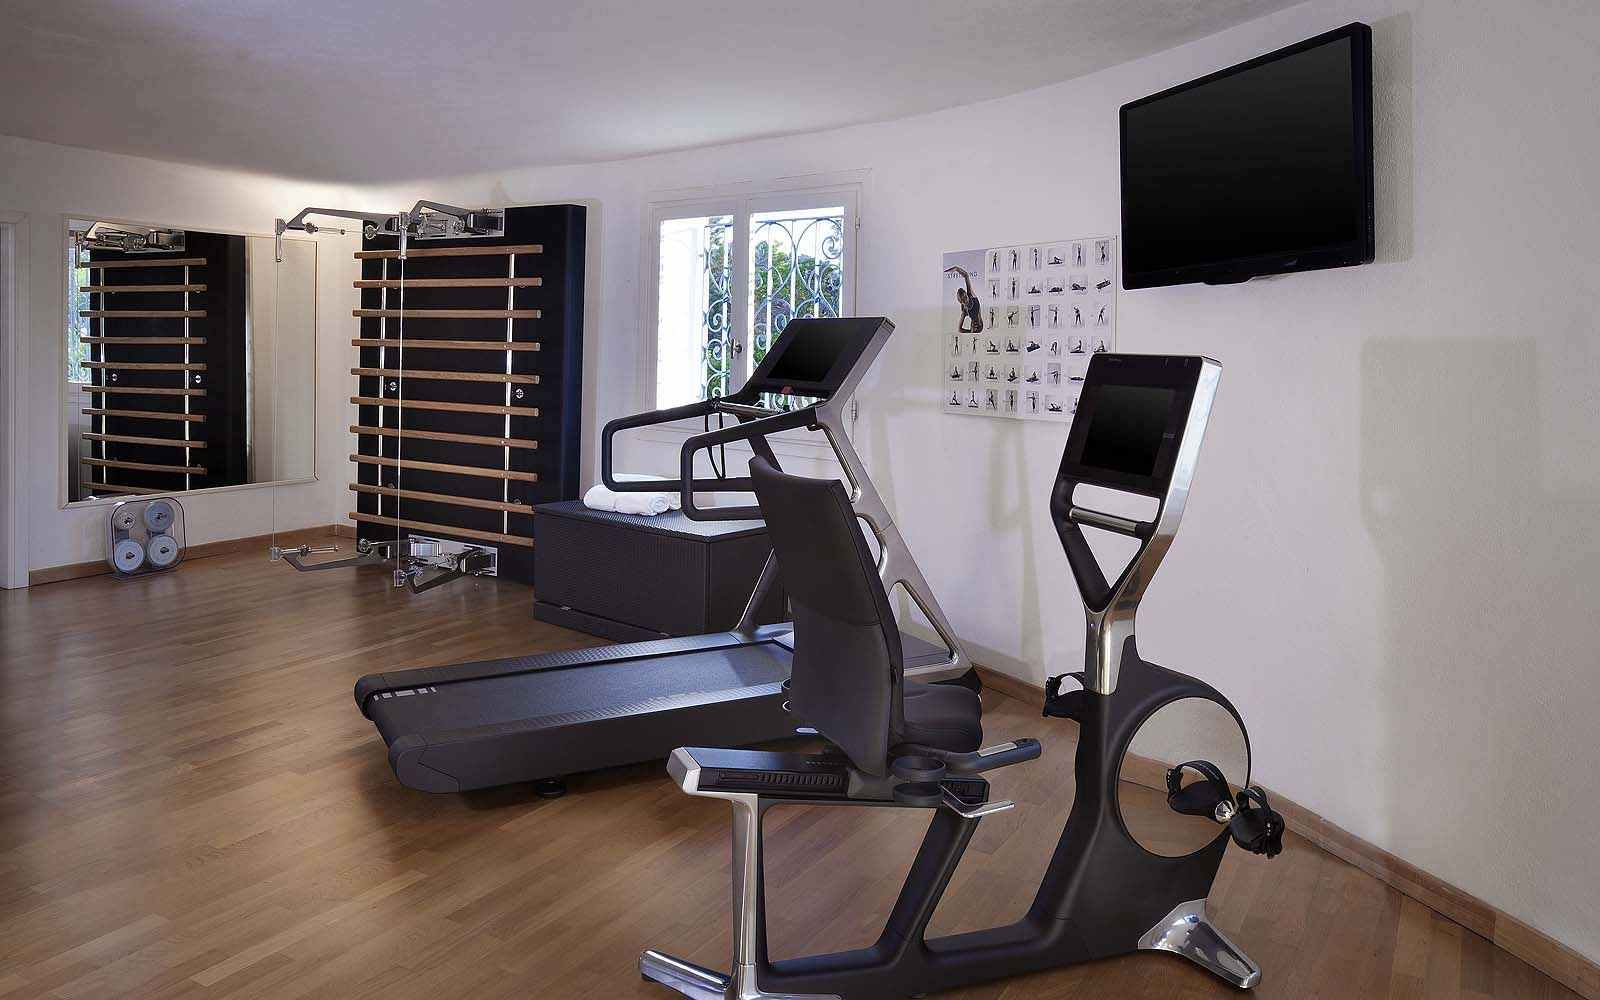 Indoor fitness centre at the Hotel Romazzino